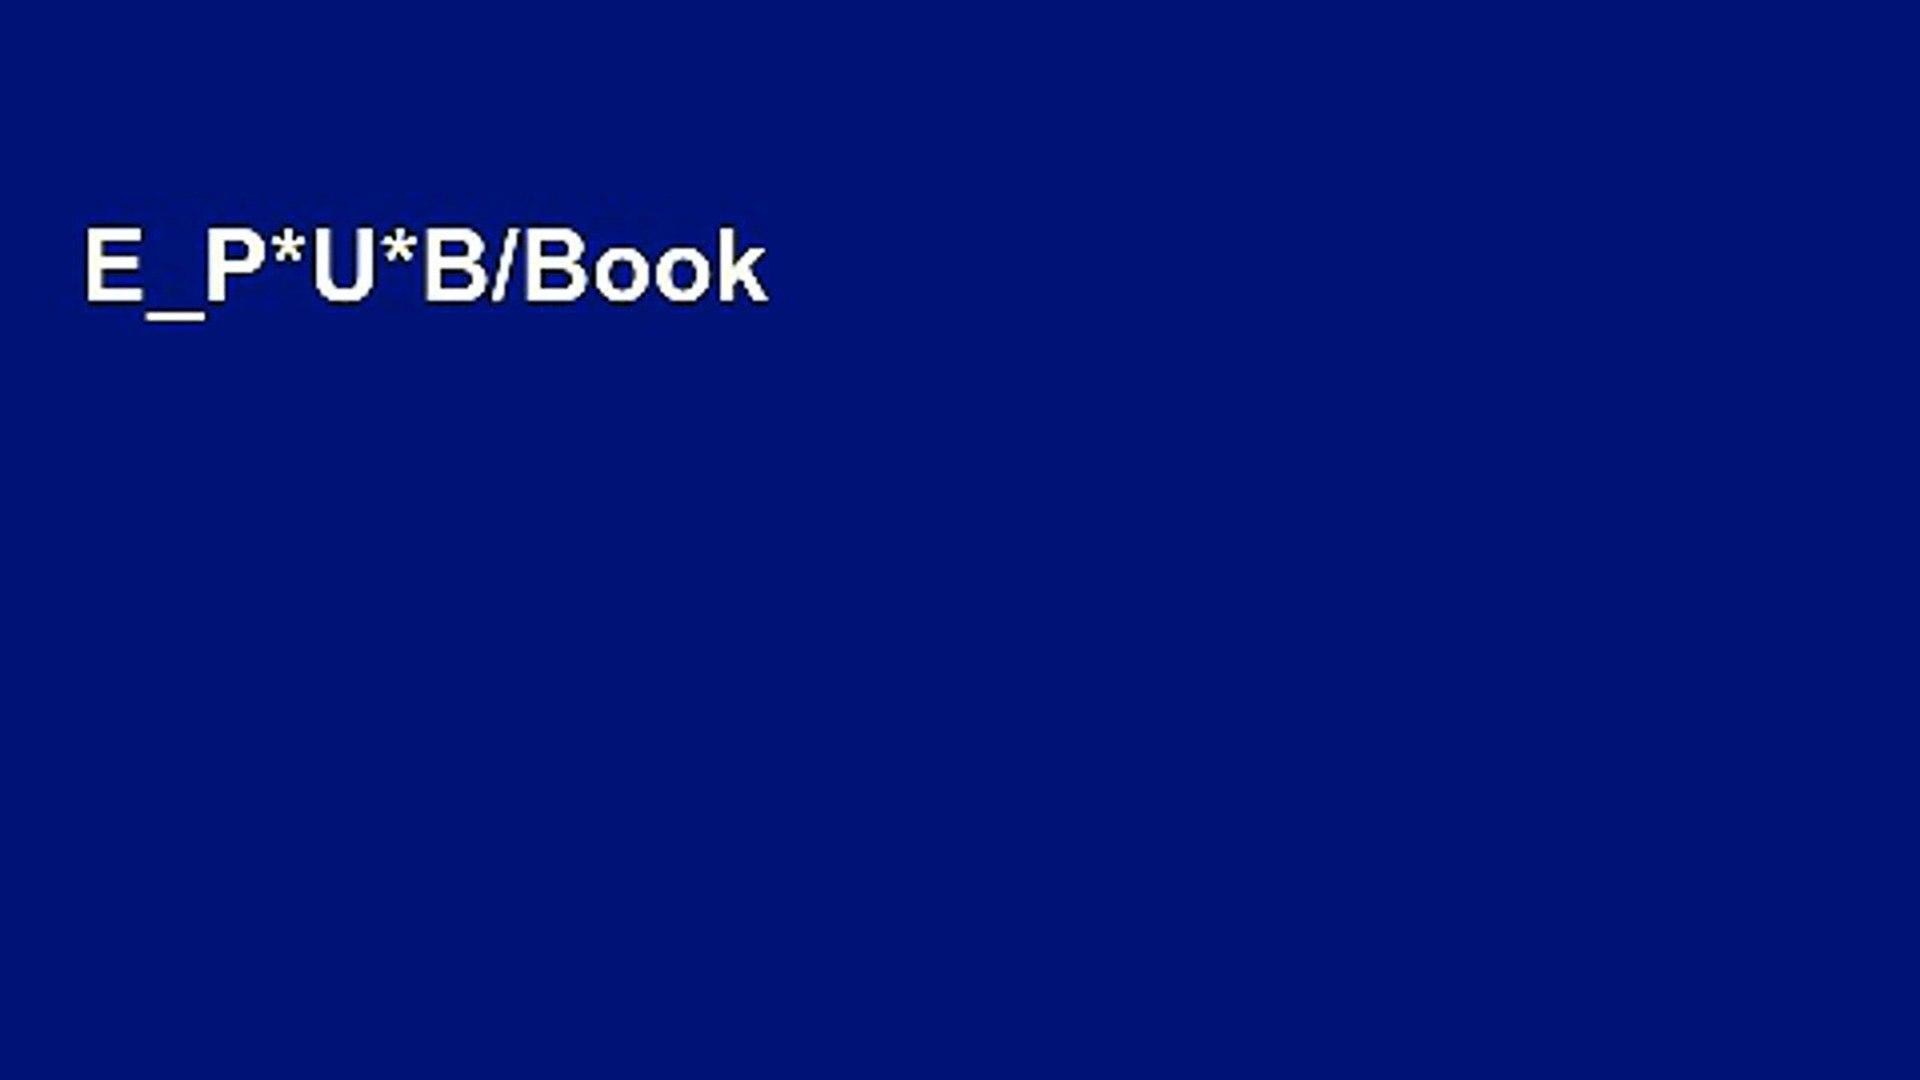 E_P*U*B/Book D.O.W.N.L.O.A.D Born of Embers (Phoenix Rising Book 1) (English Edition) [(P*D*F)